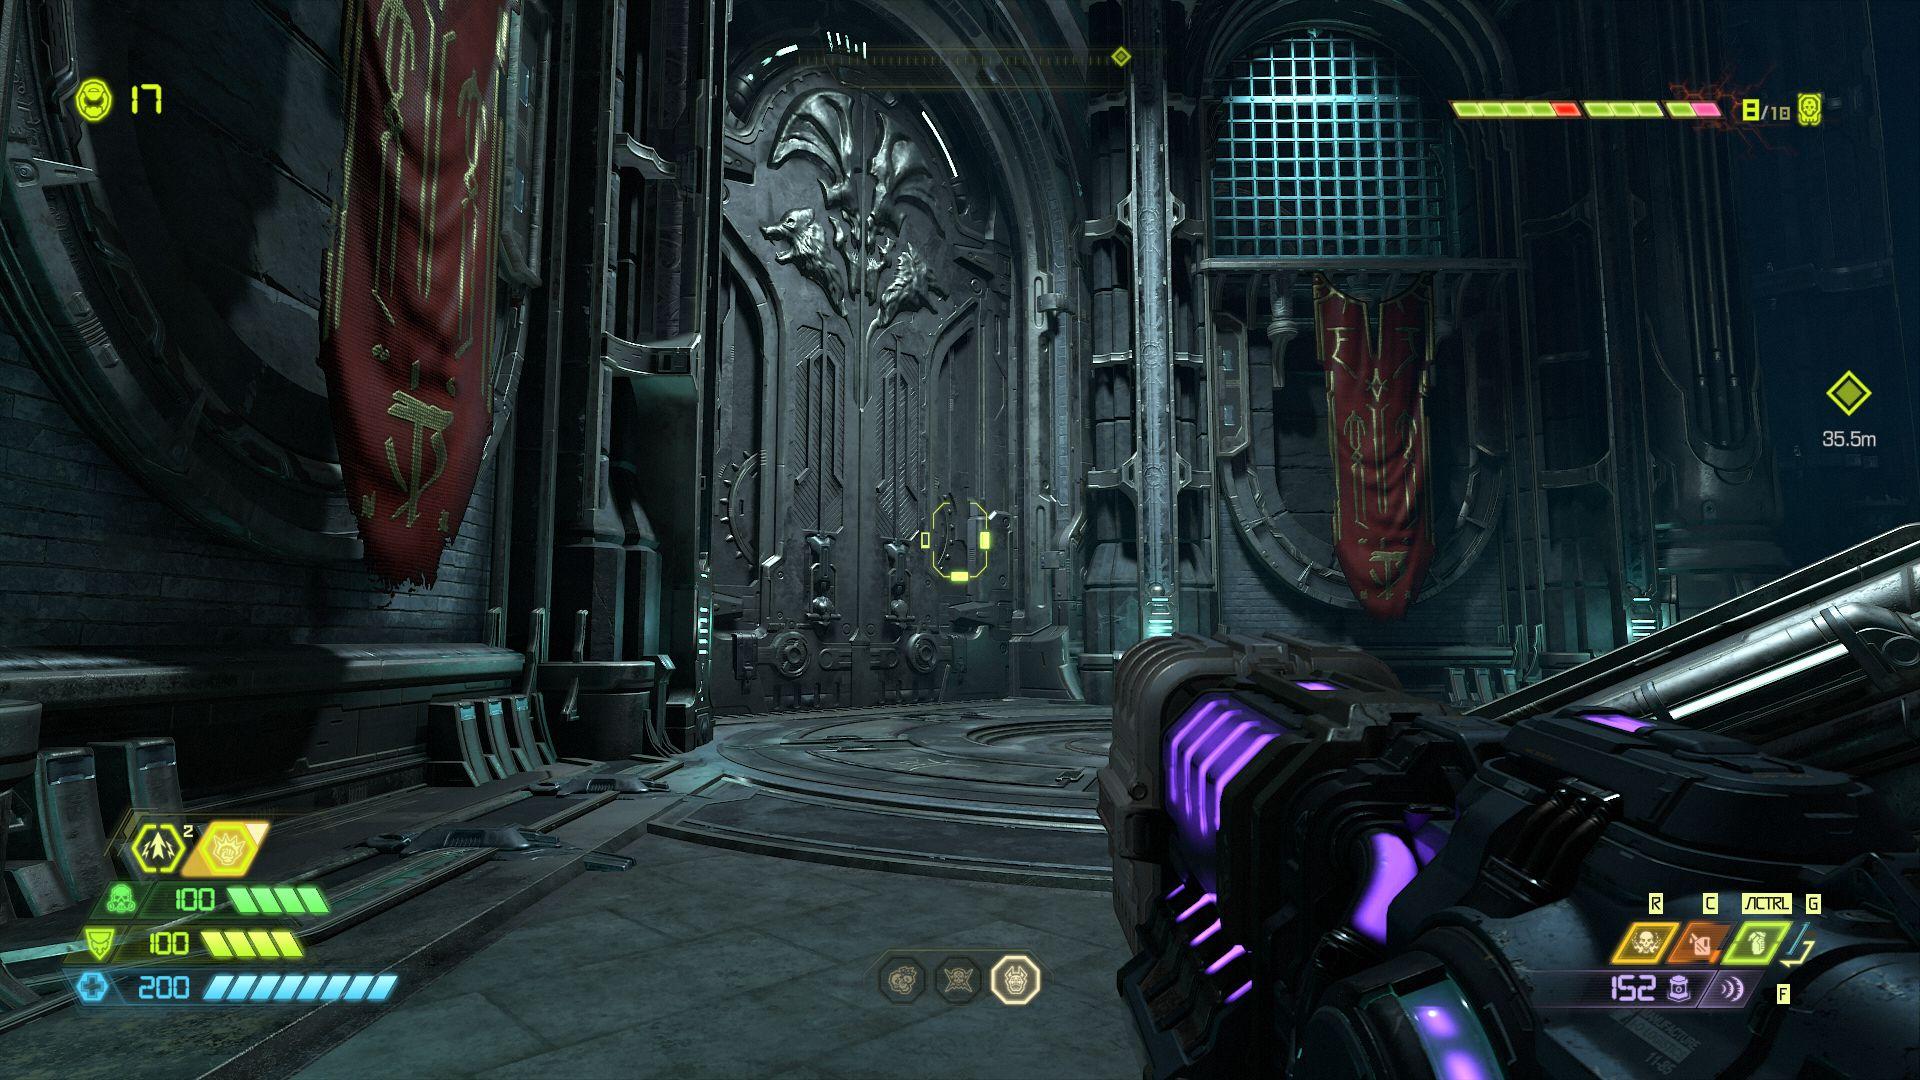 00089.Jpg - Doom Eternal